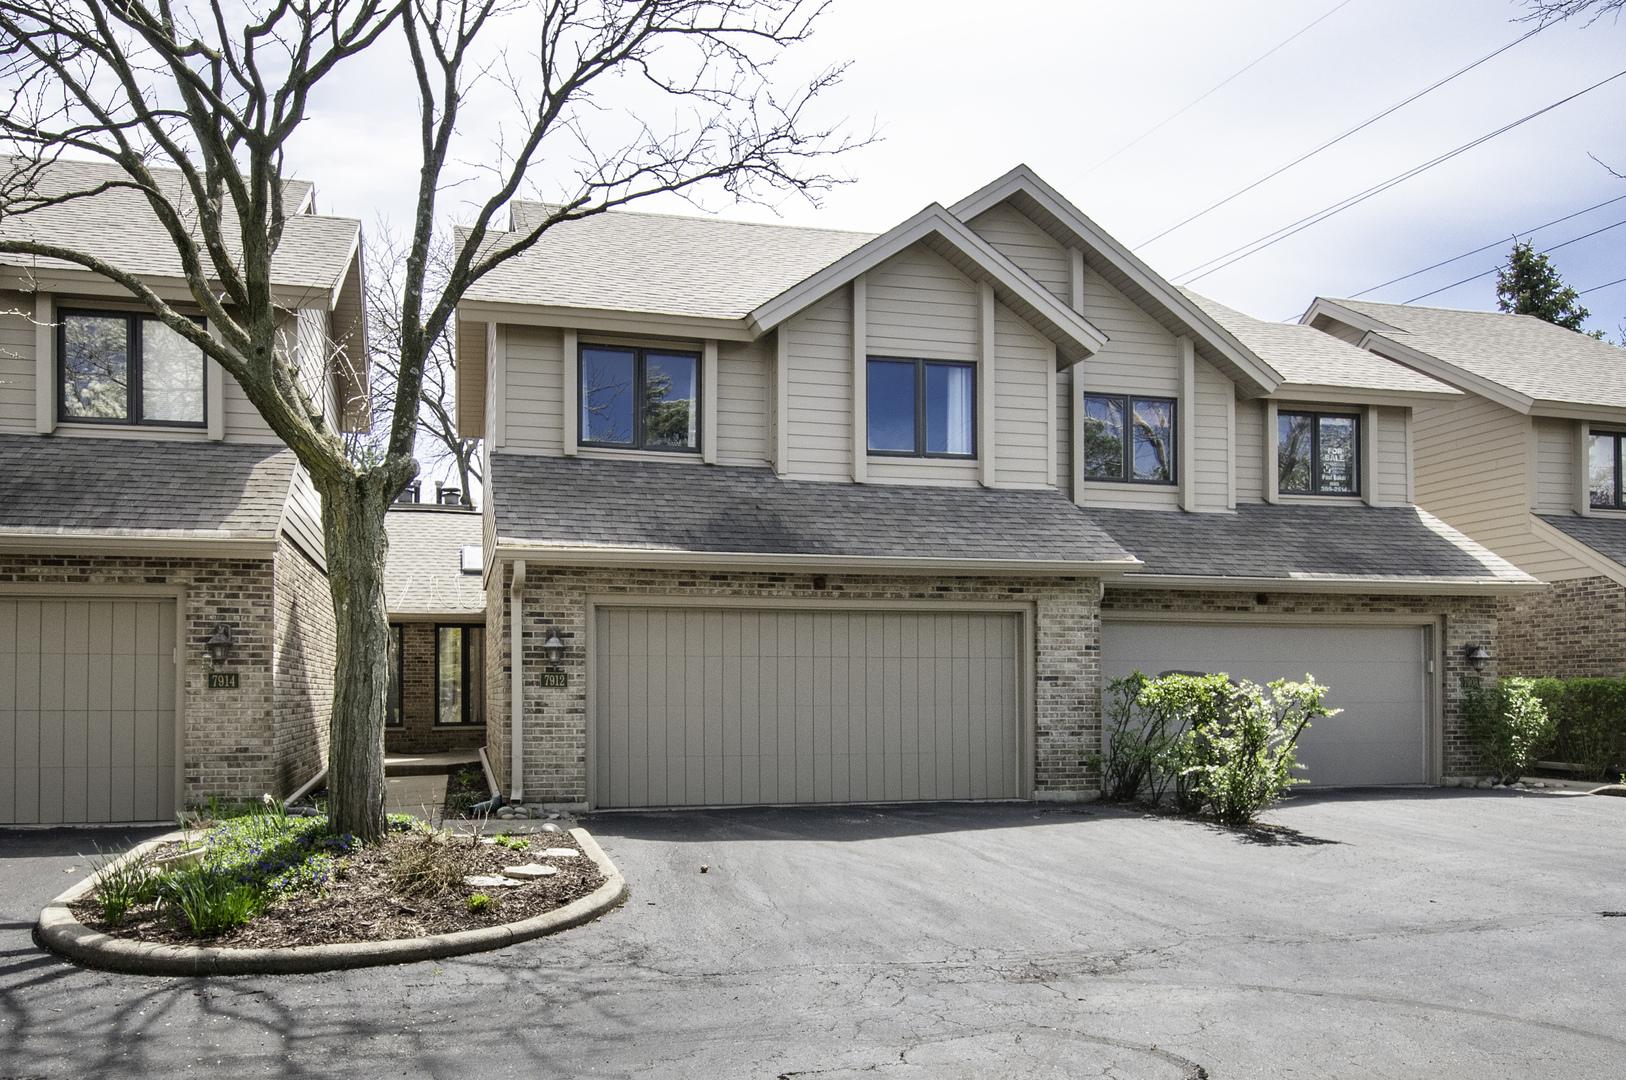 7912 South Garfield Avenue, Burr Ridge in Du Page County, IL 60527 Home for Sale